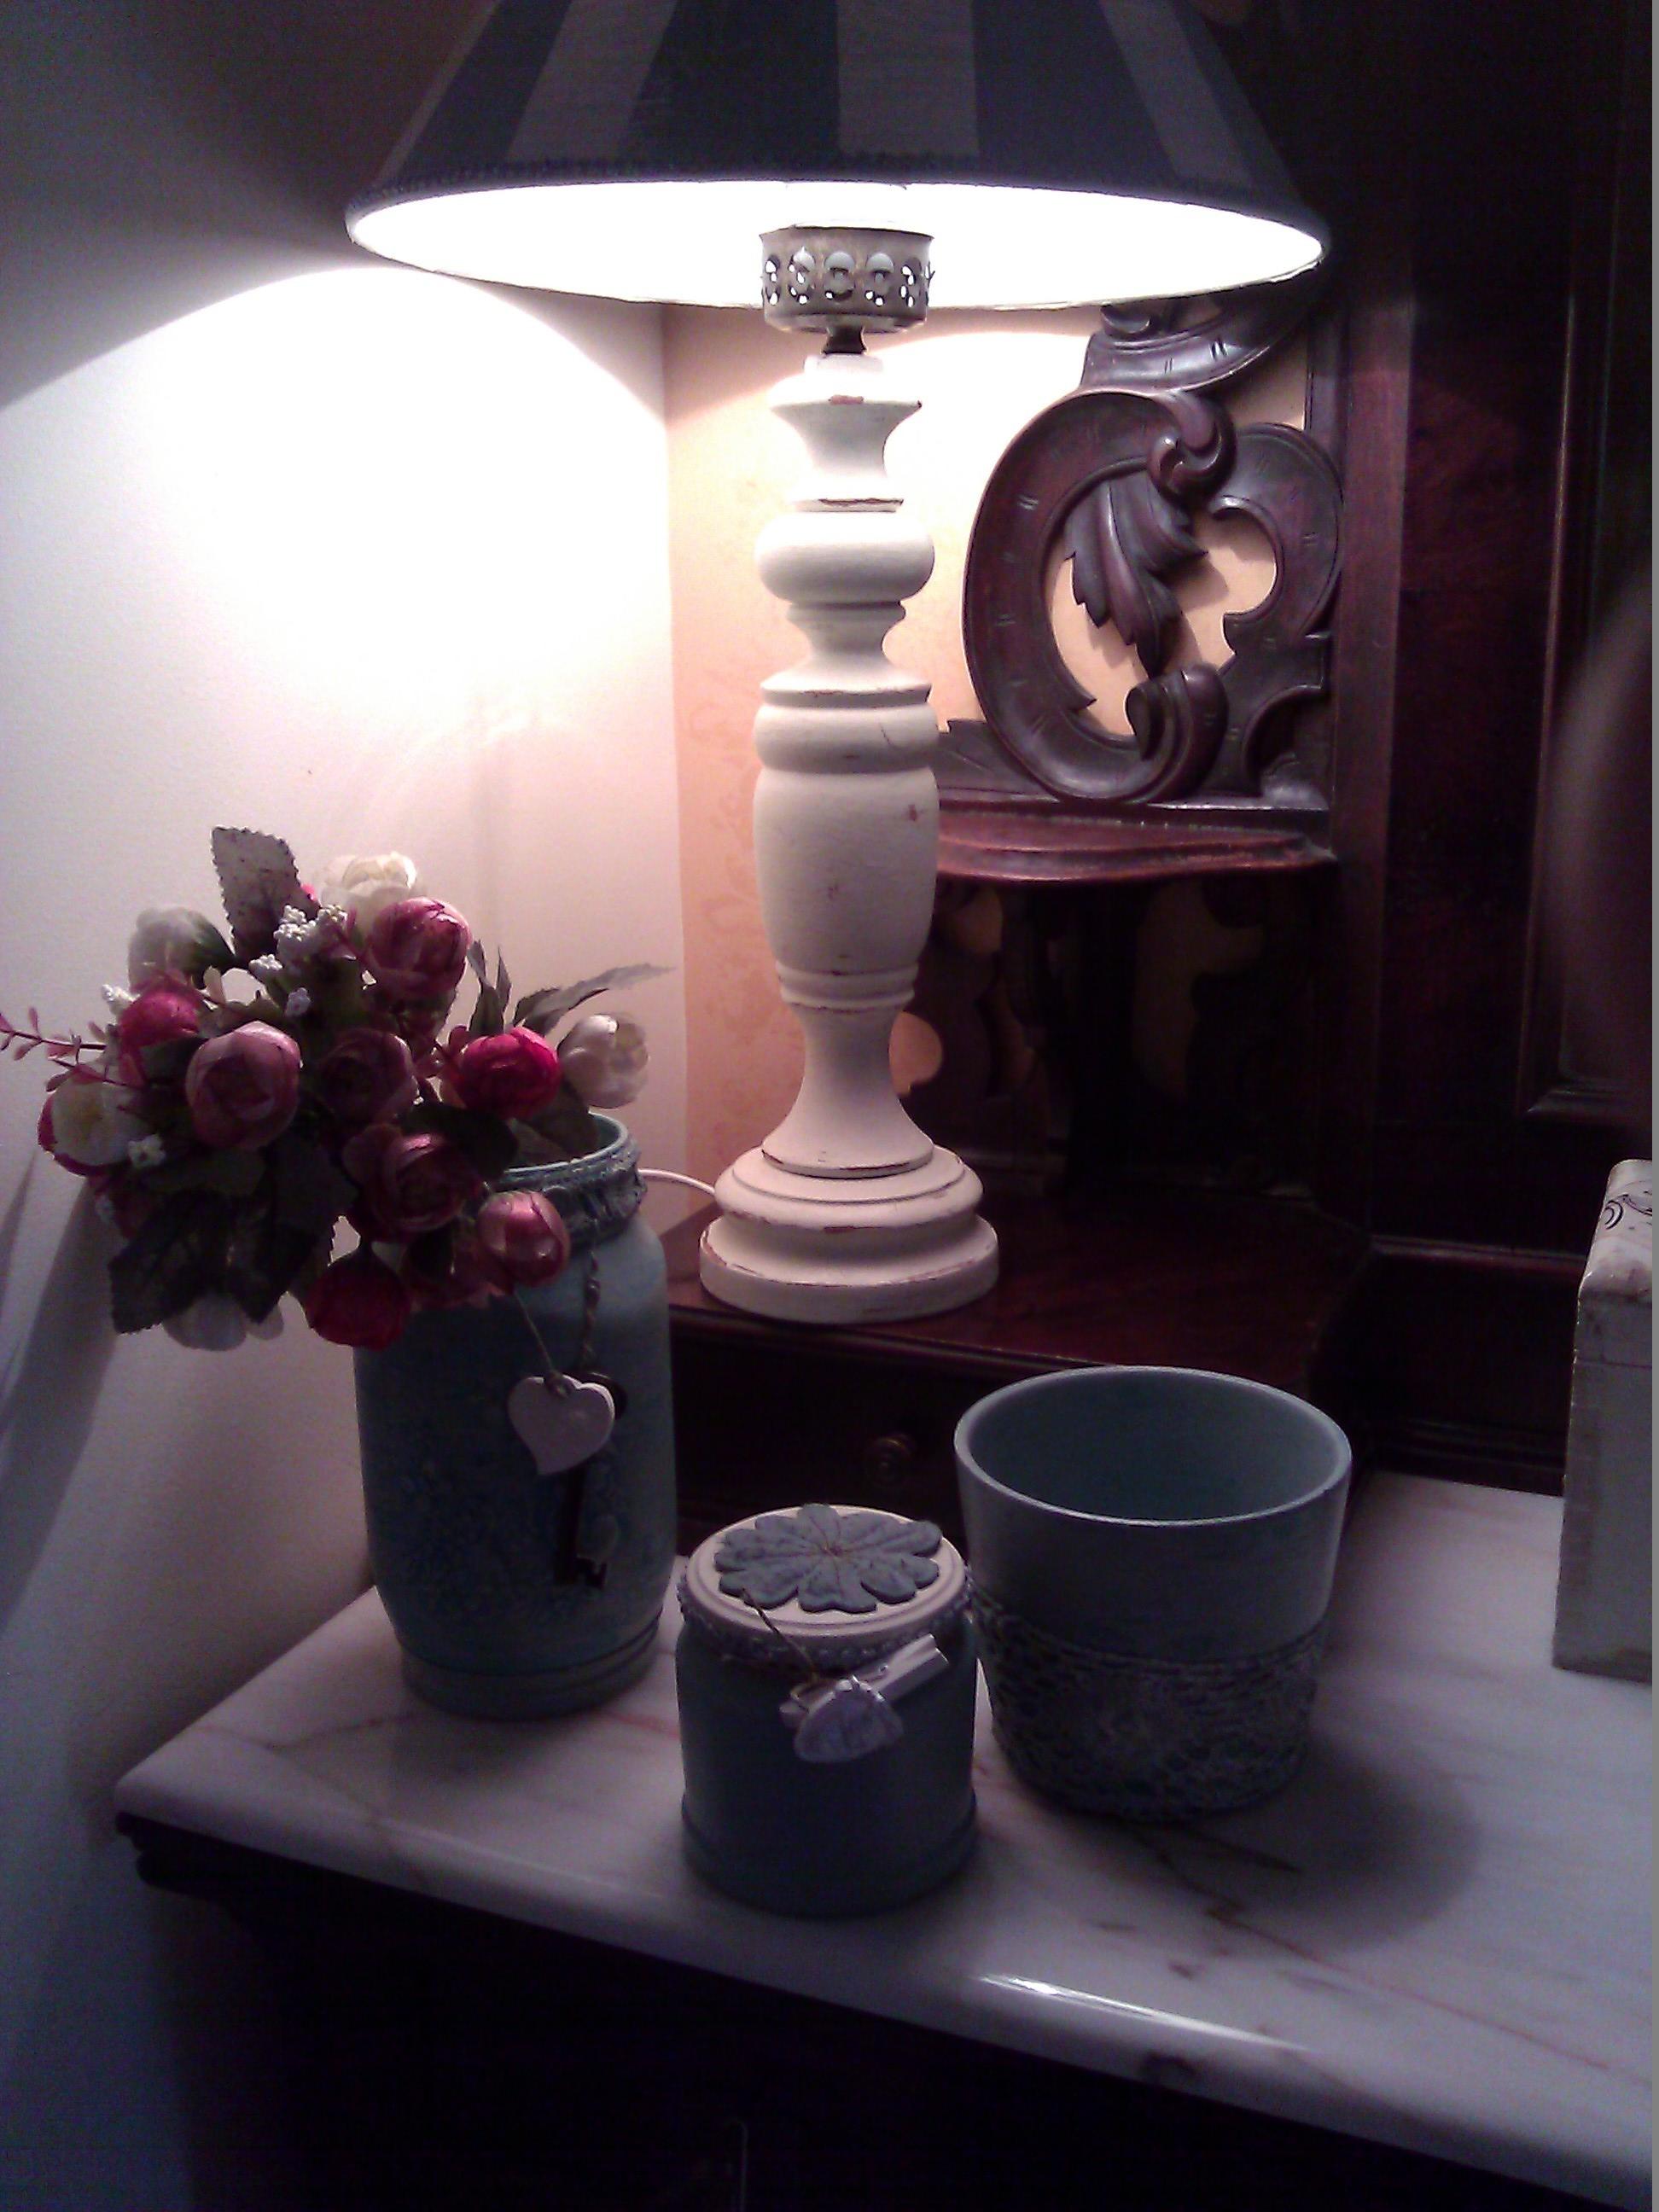 Vasetti pitturati e con simbologie shabby